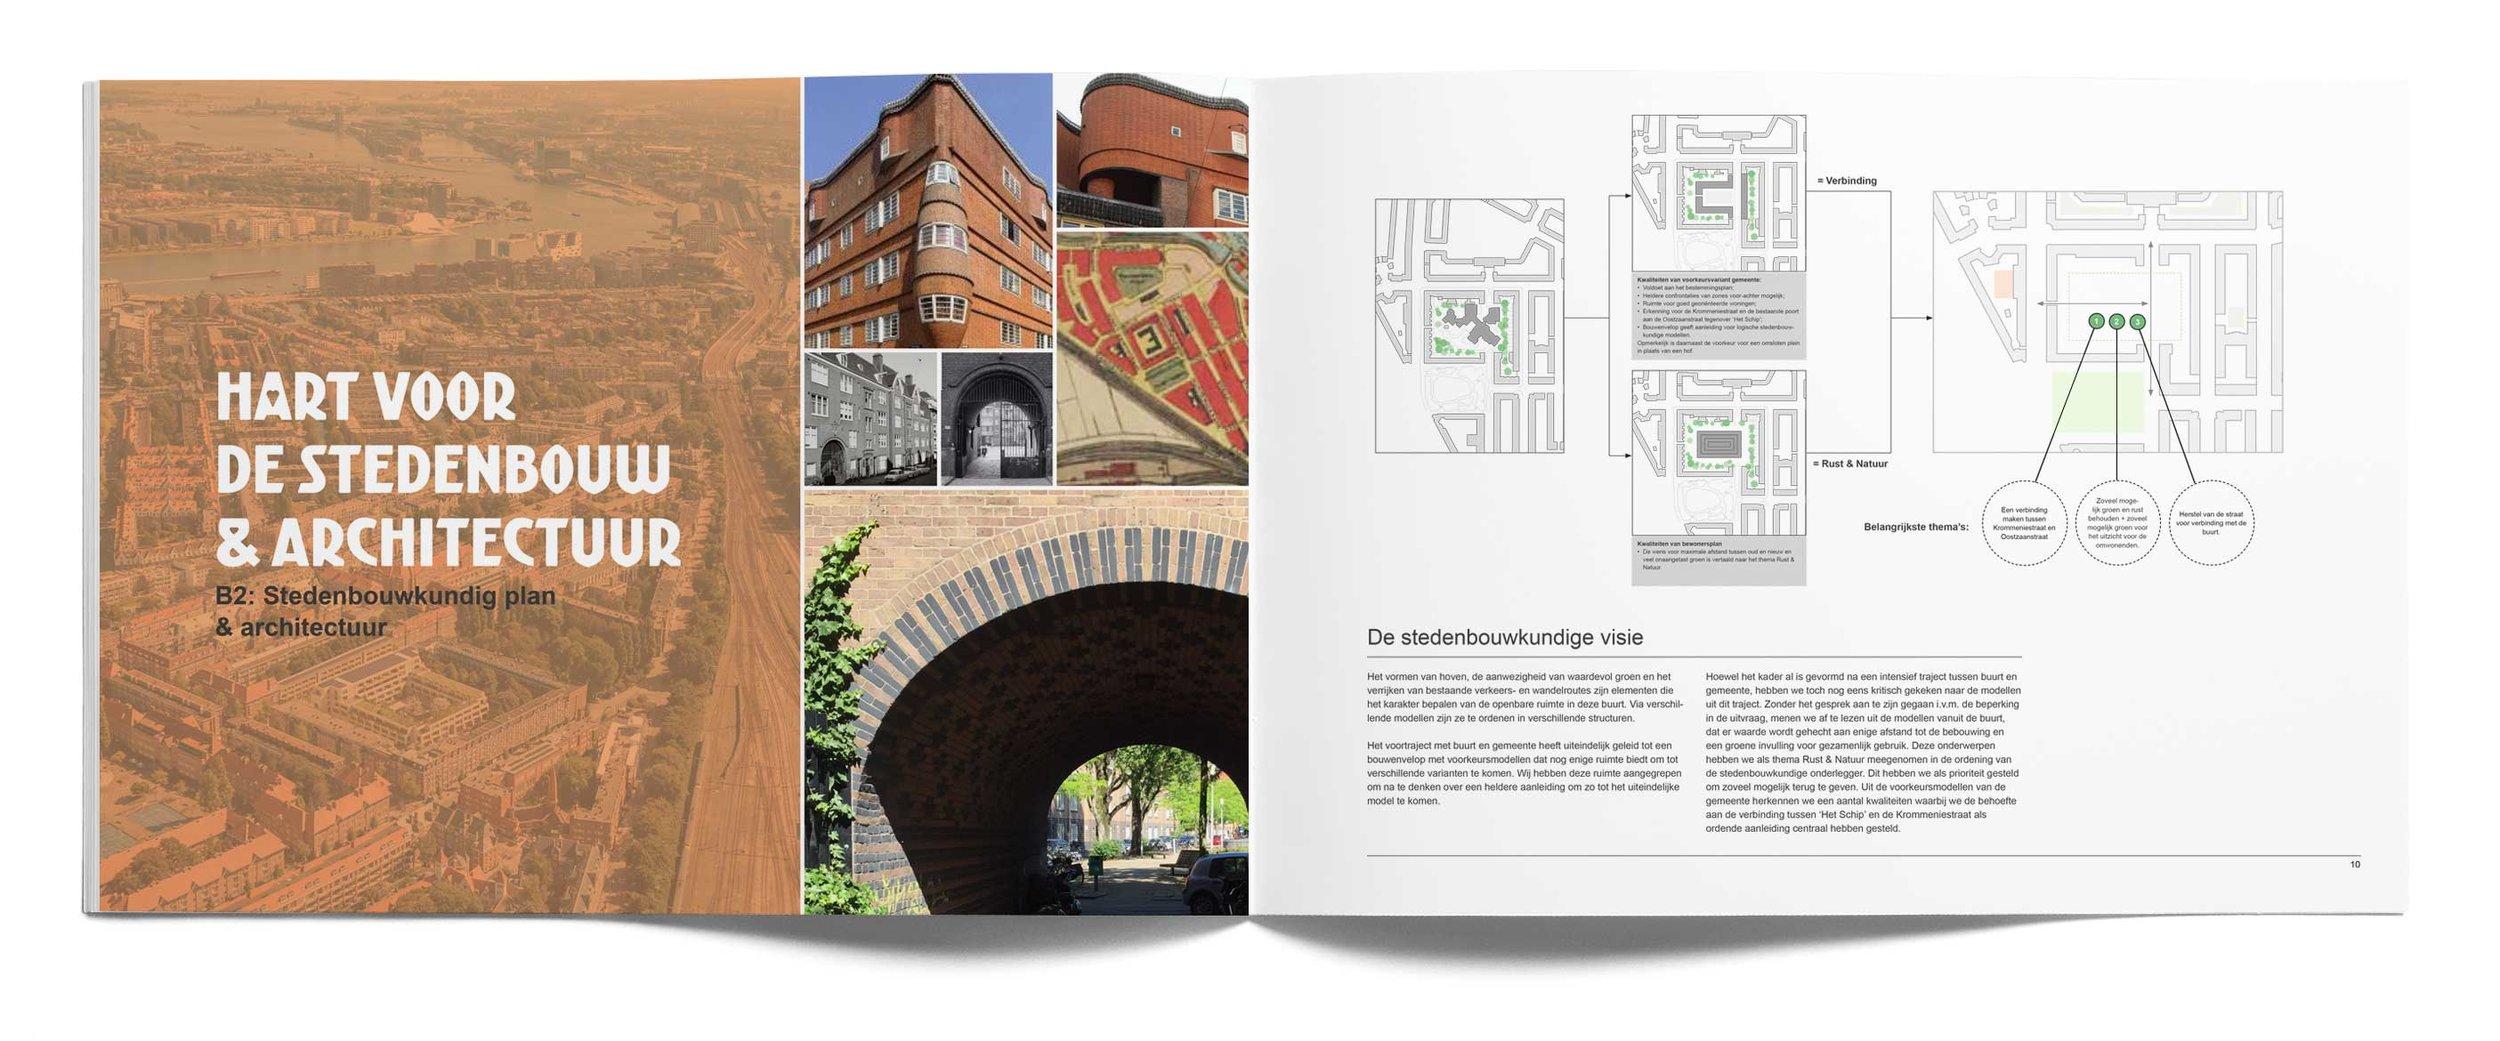 05_spaarndammerhart_architectuur.jpg